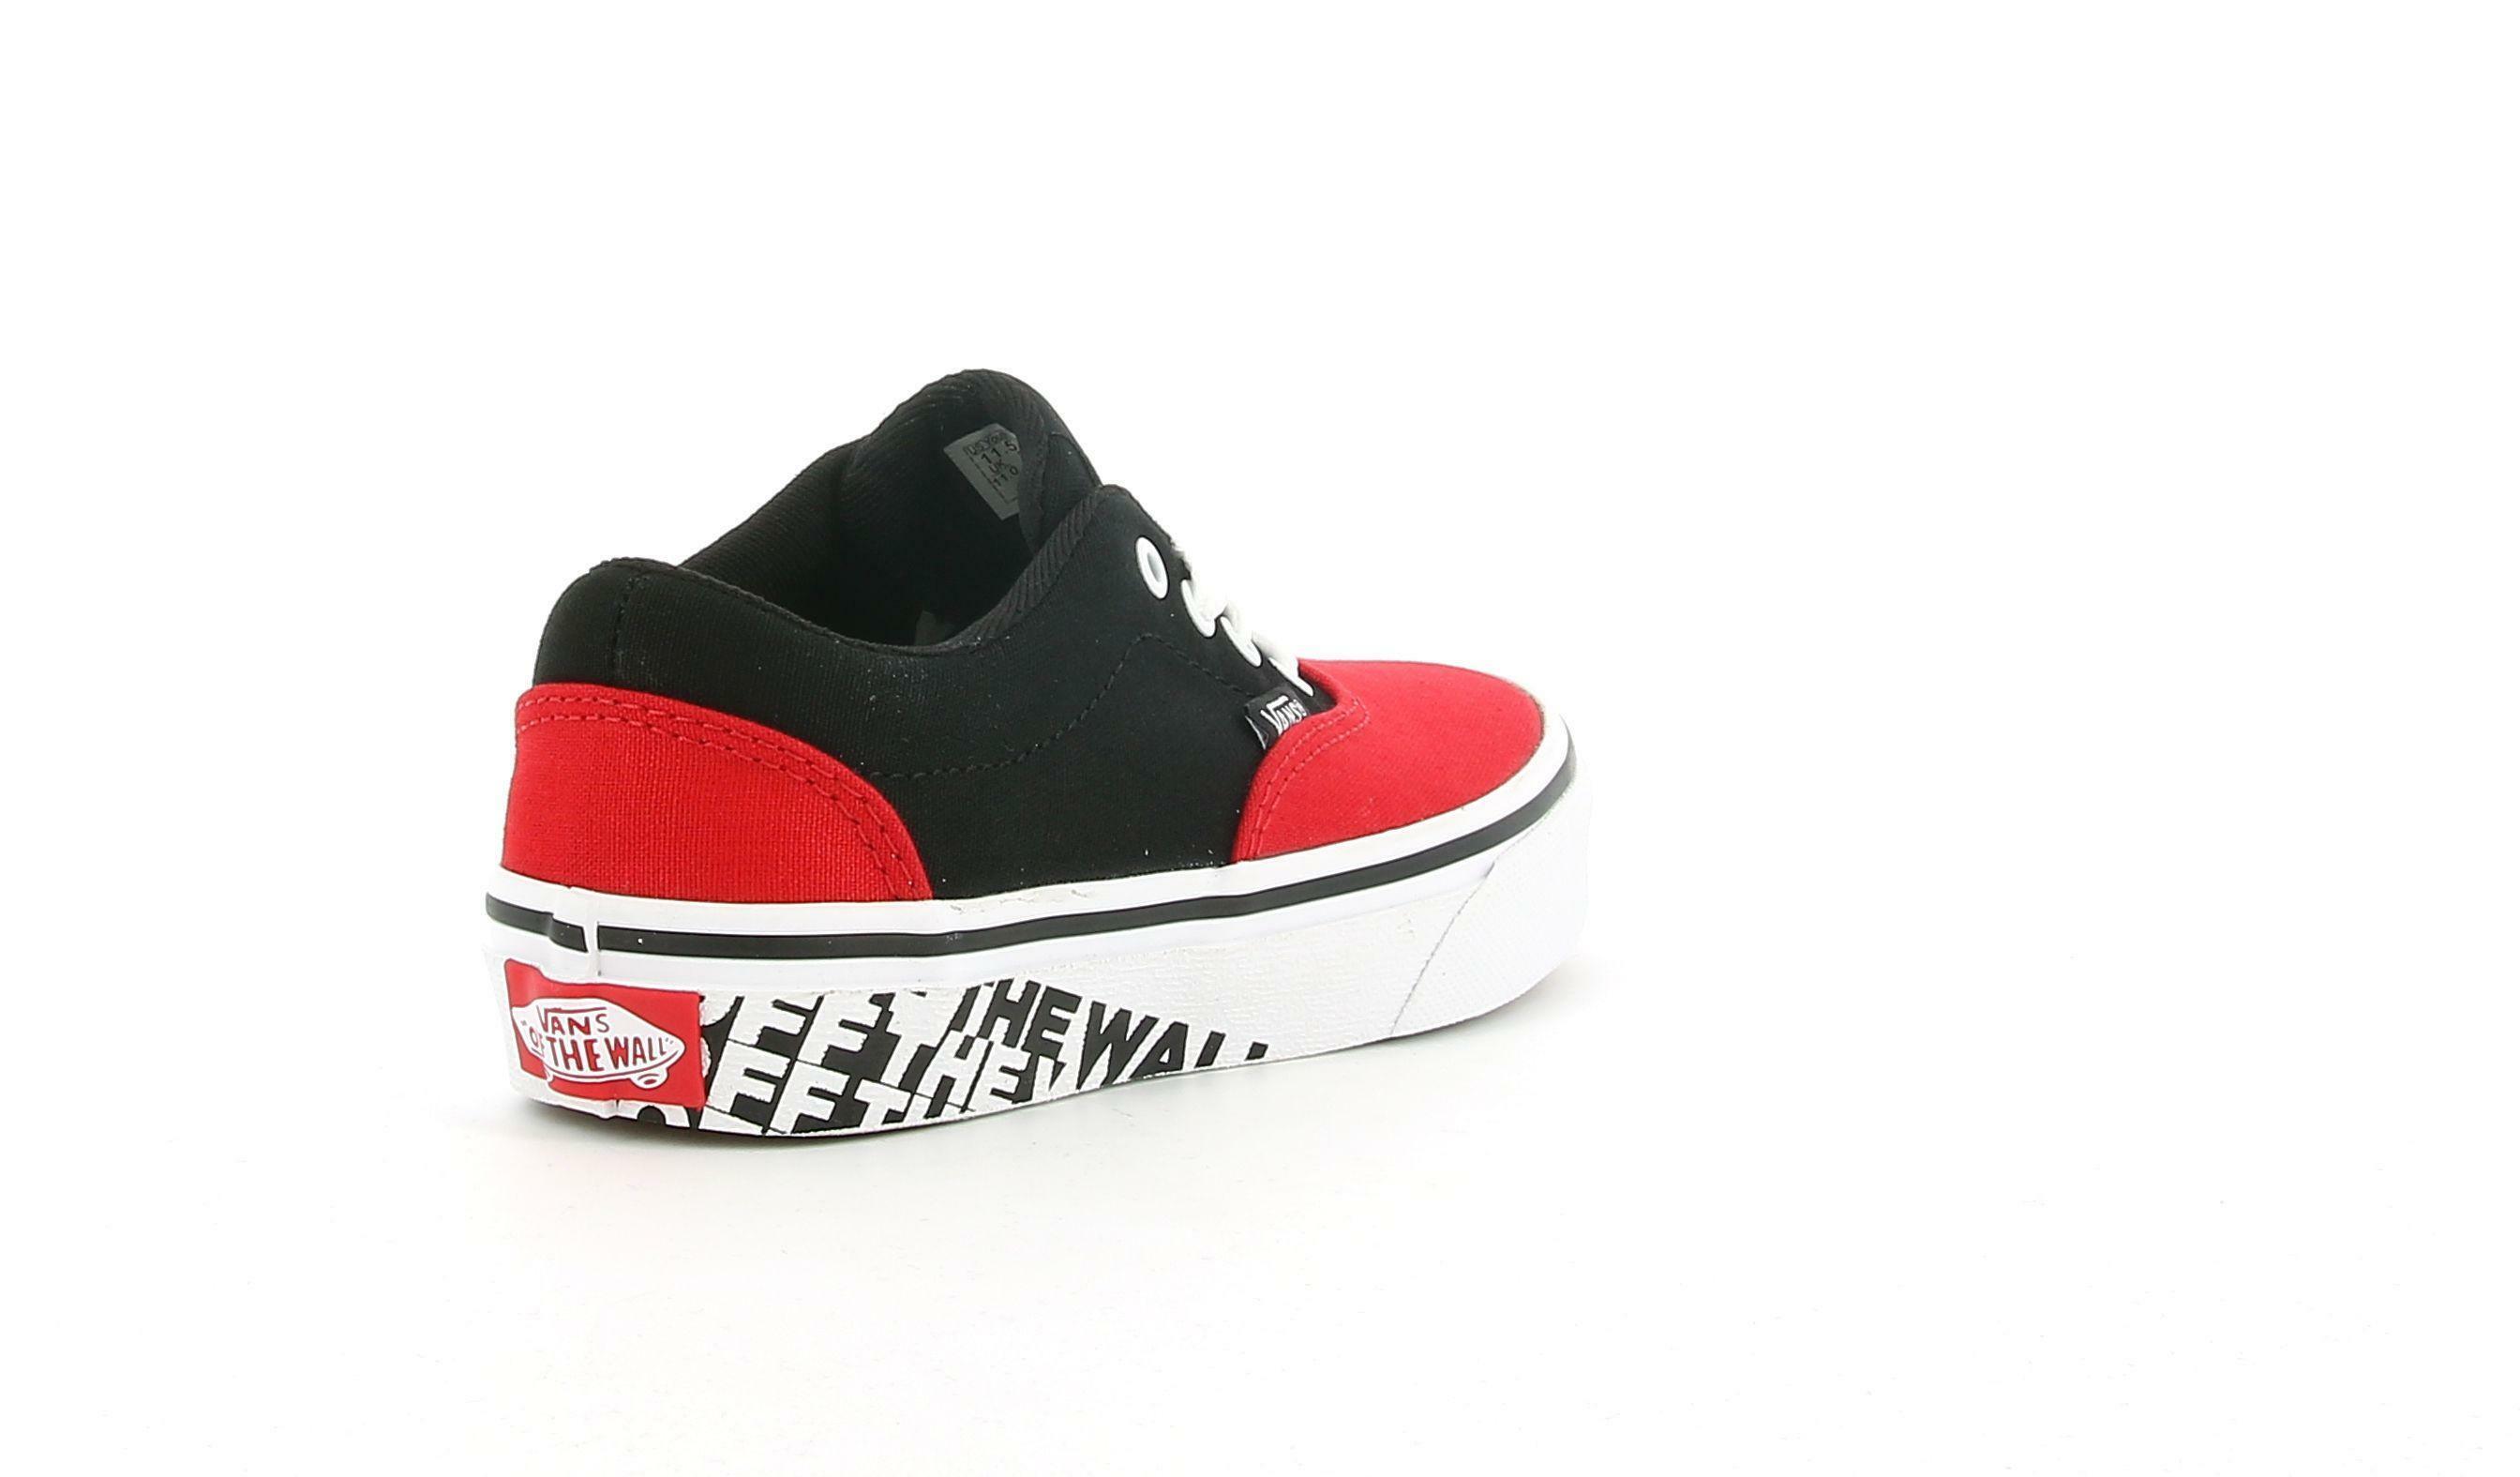 vans vans yt doheny  otw sidewall  vn0a3mwa3s11 sneaker bassa unisex junior rossa e nera